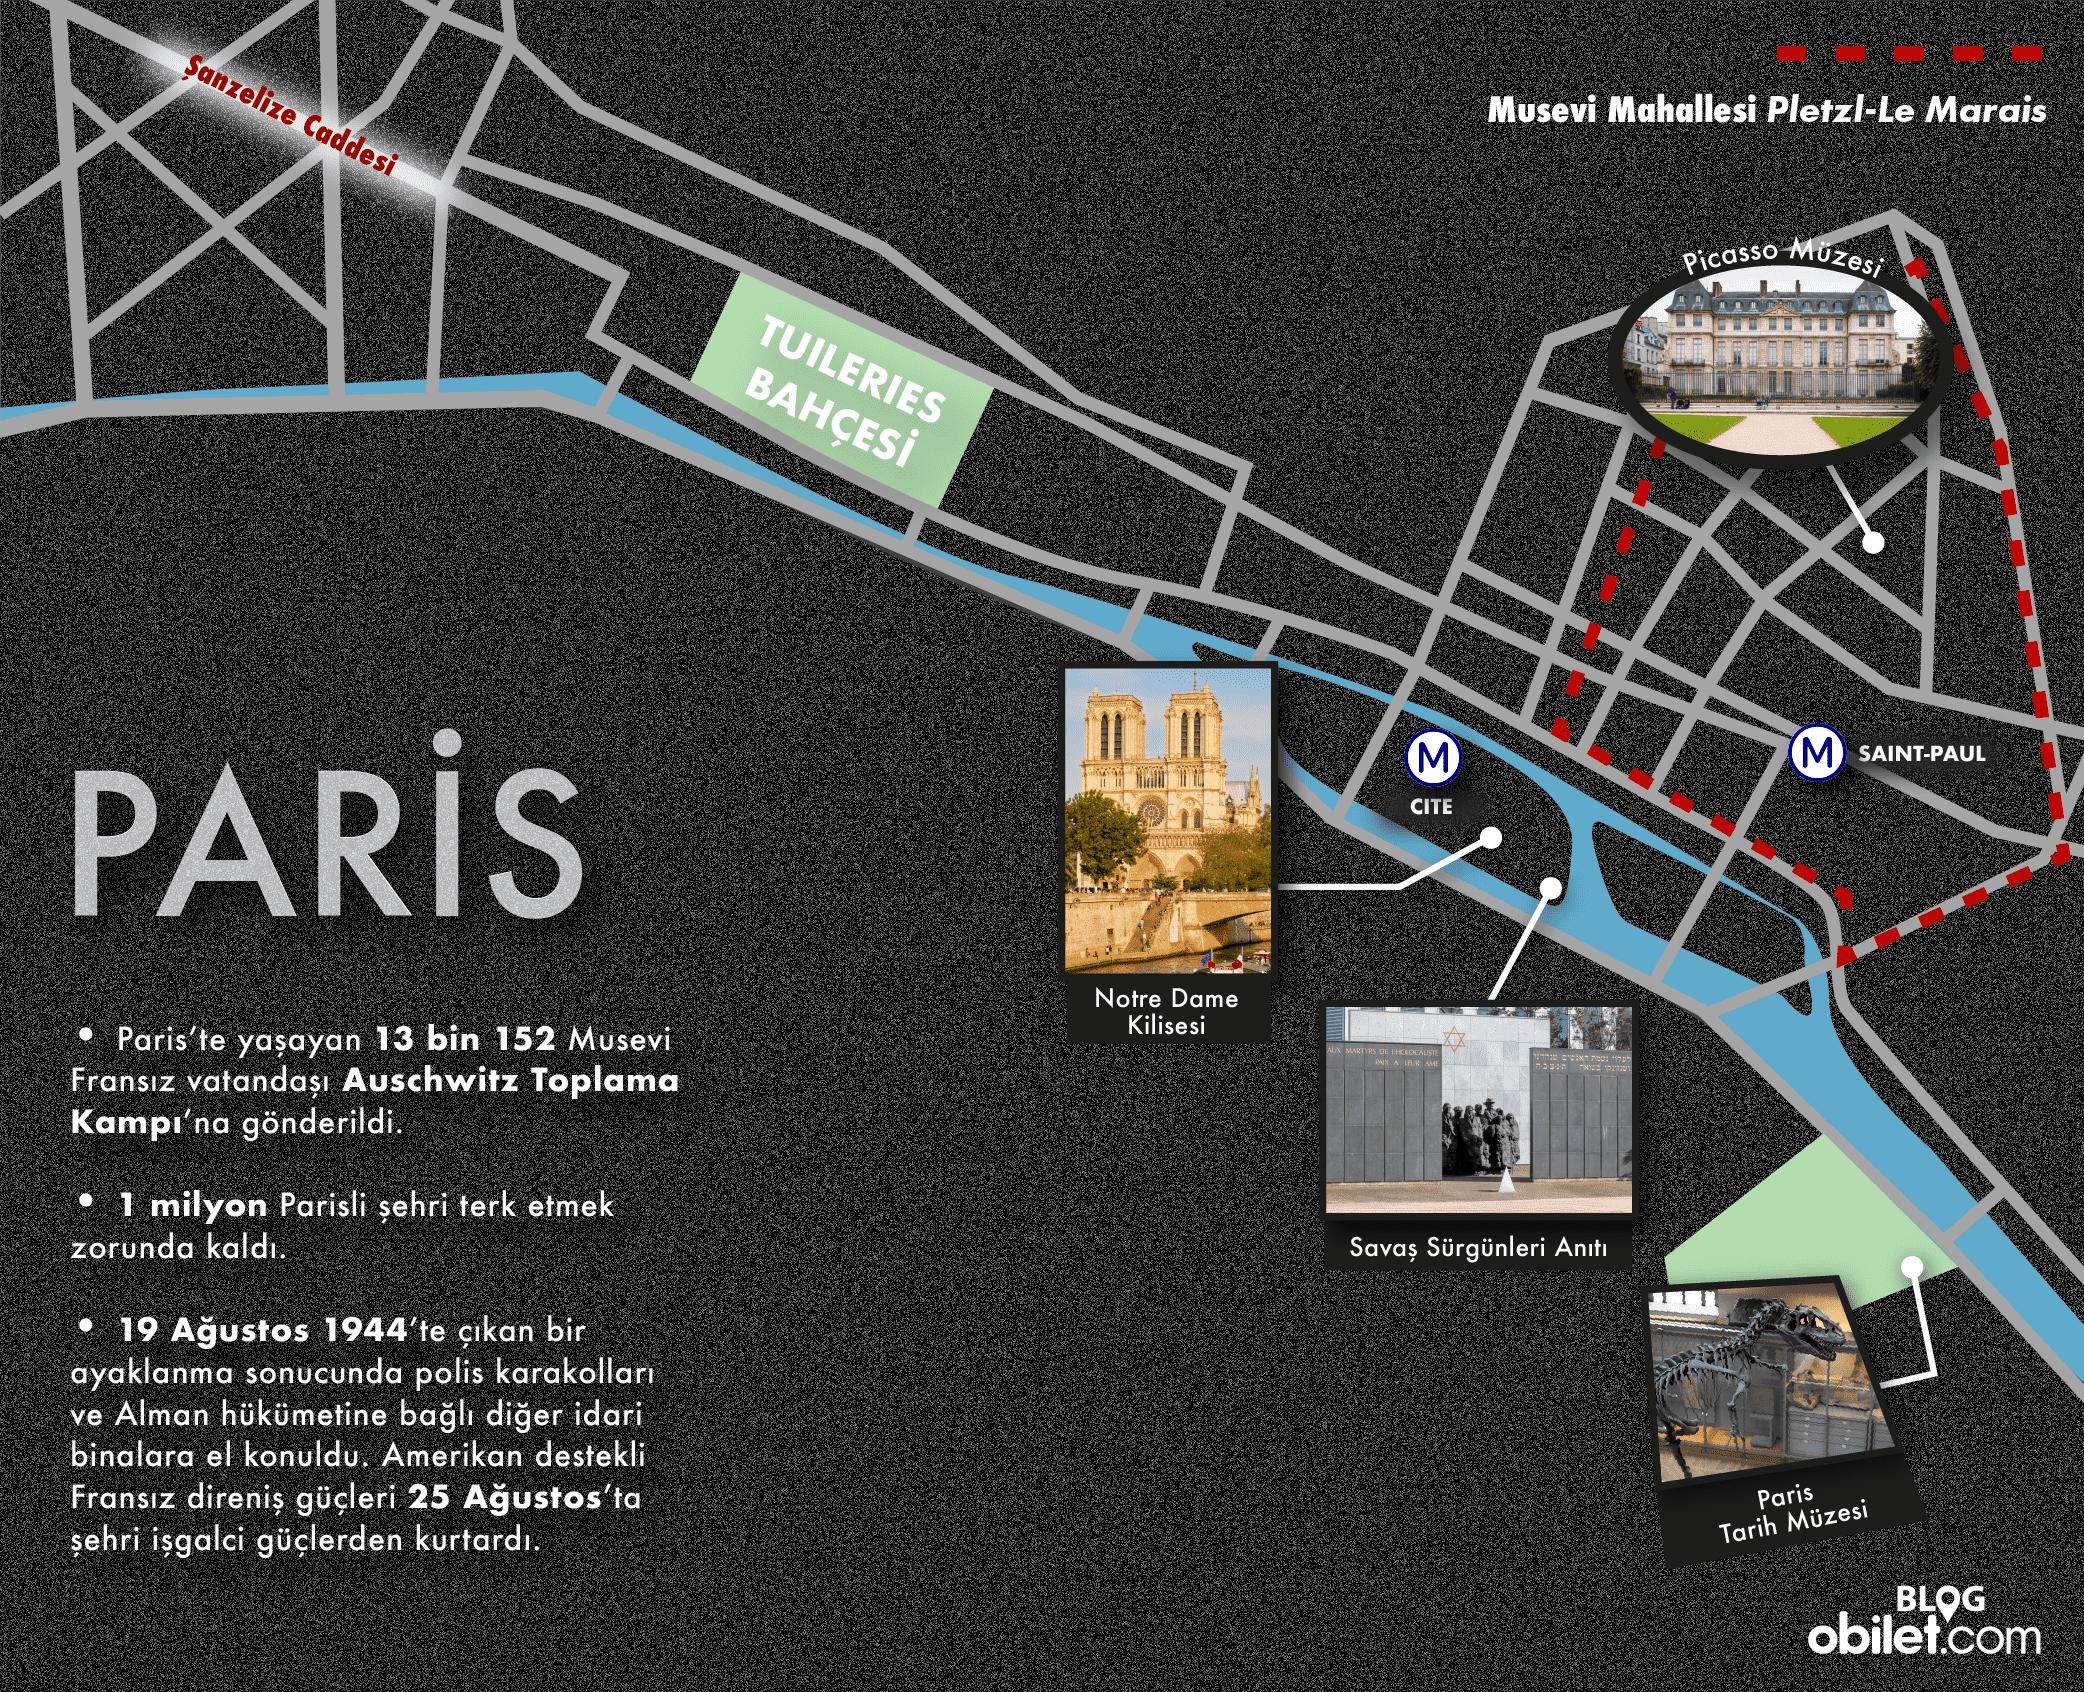 Paris Harita II. Dünya Savaşı